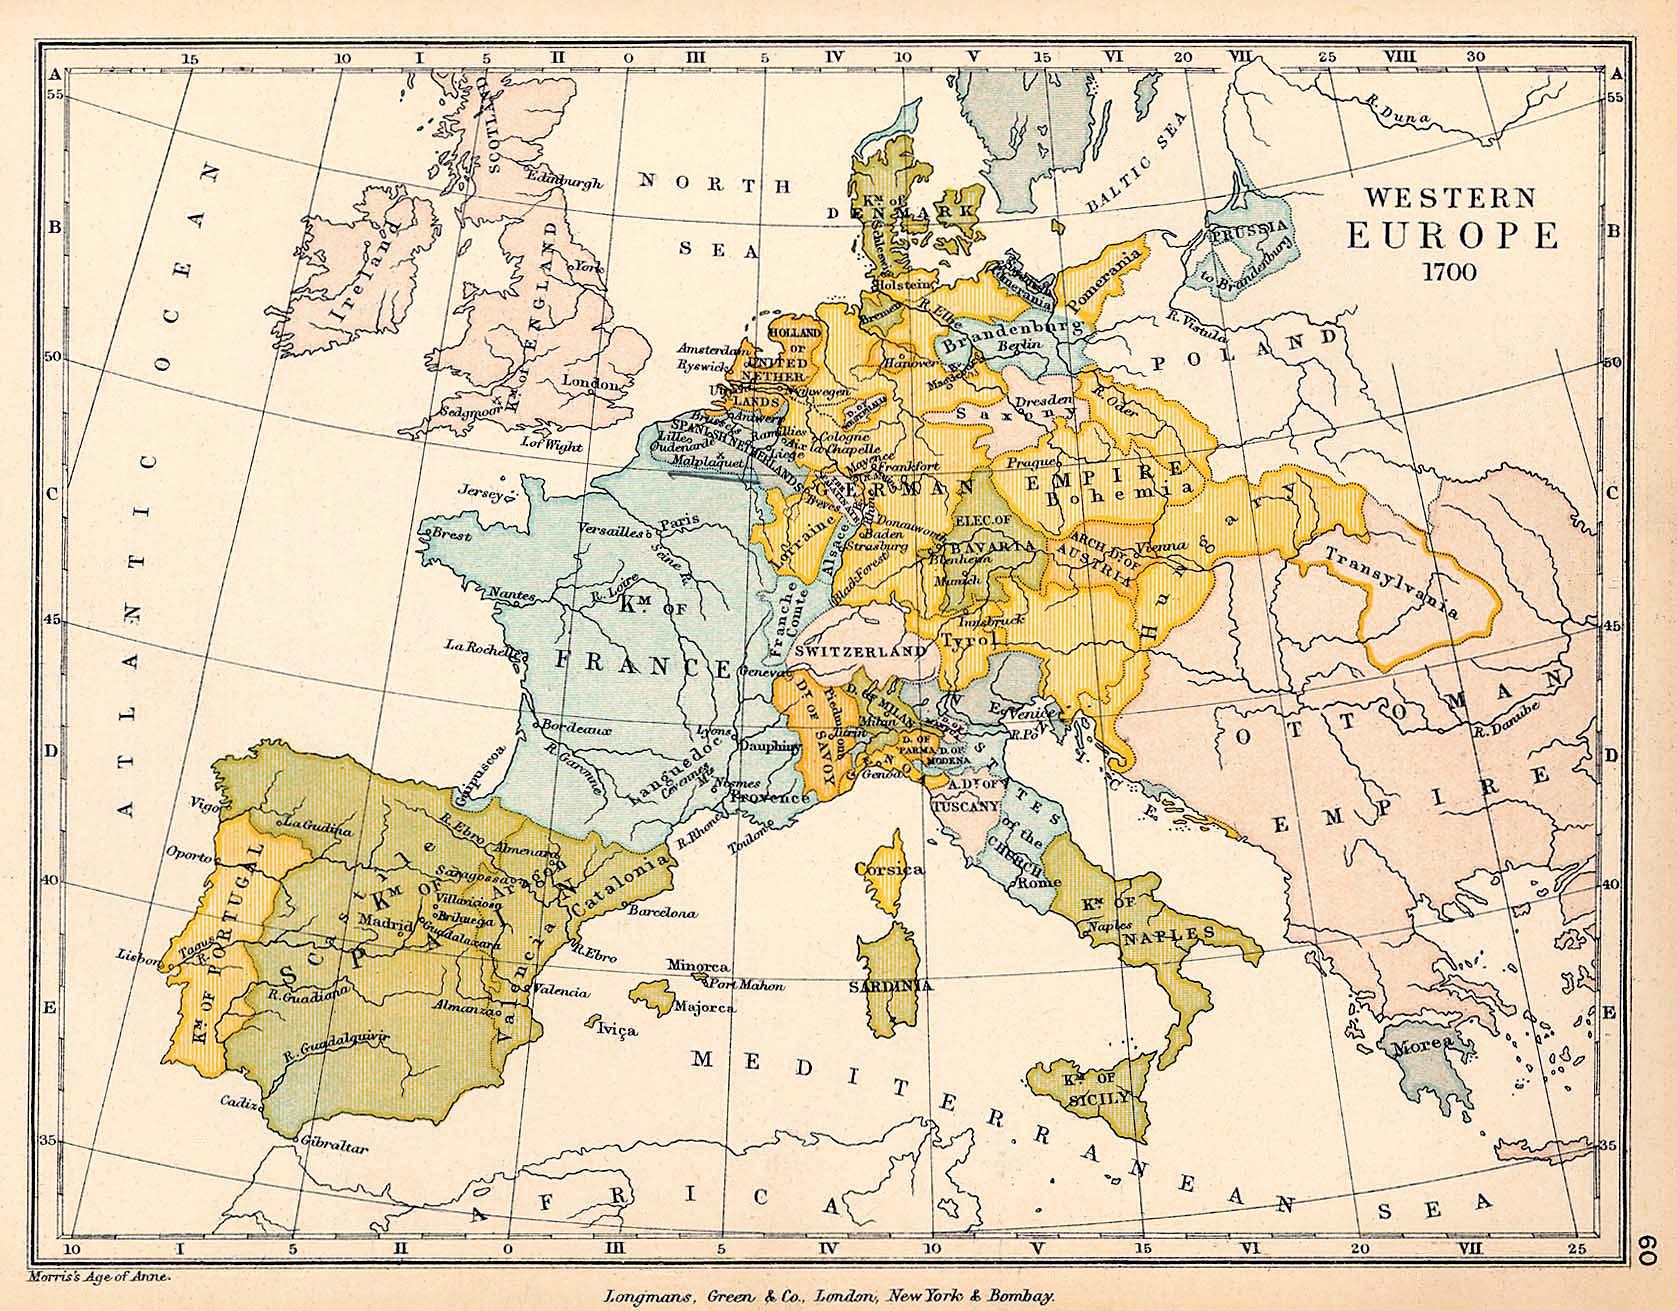 nationalism in 18th century europe Nationalism grows in europe: timeline european nationalism in the late 18th century quiz nationalism grows in europe.